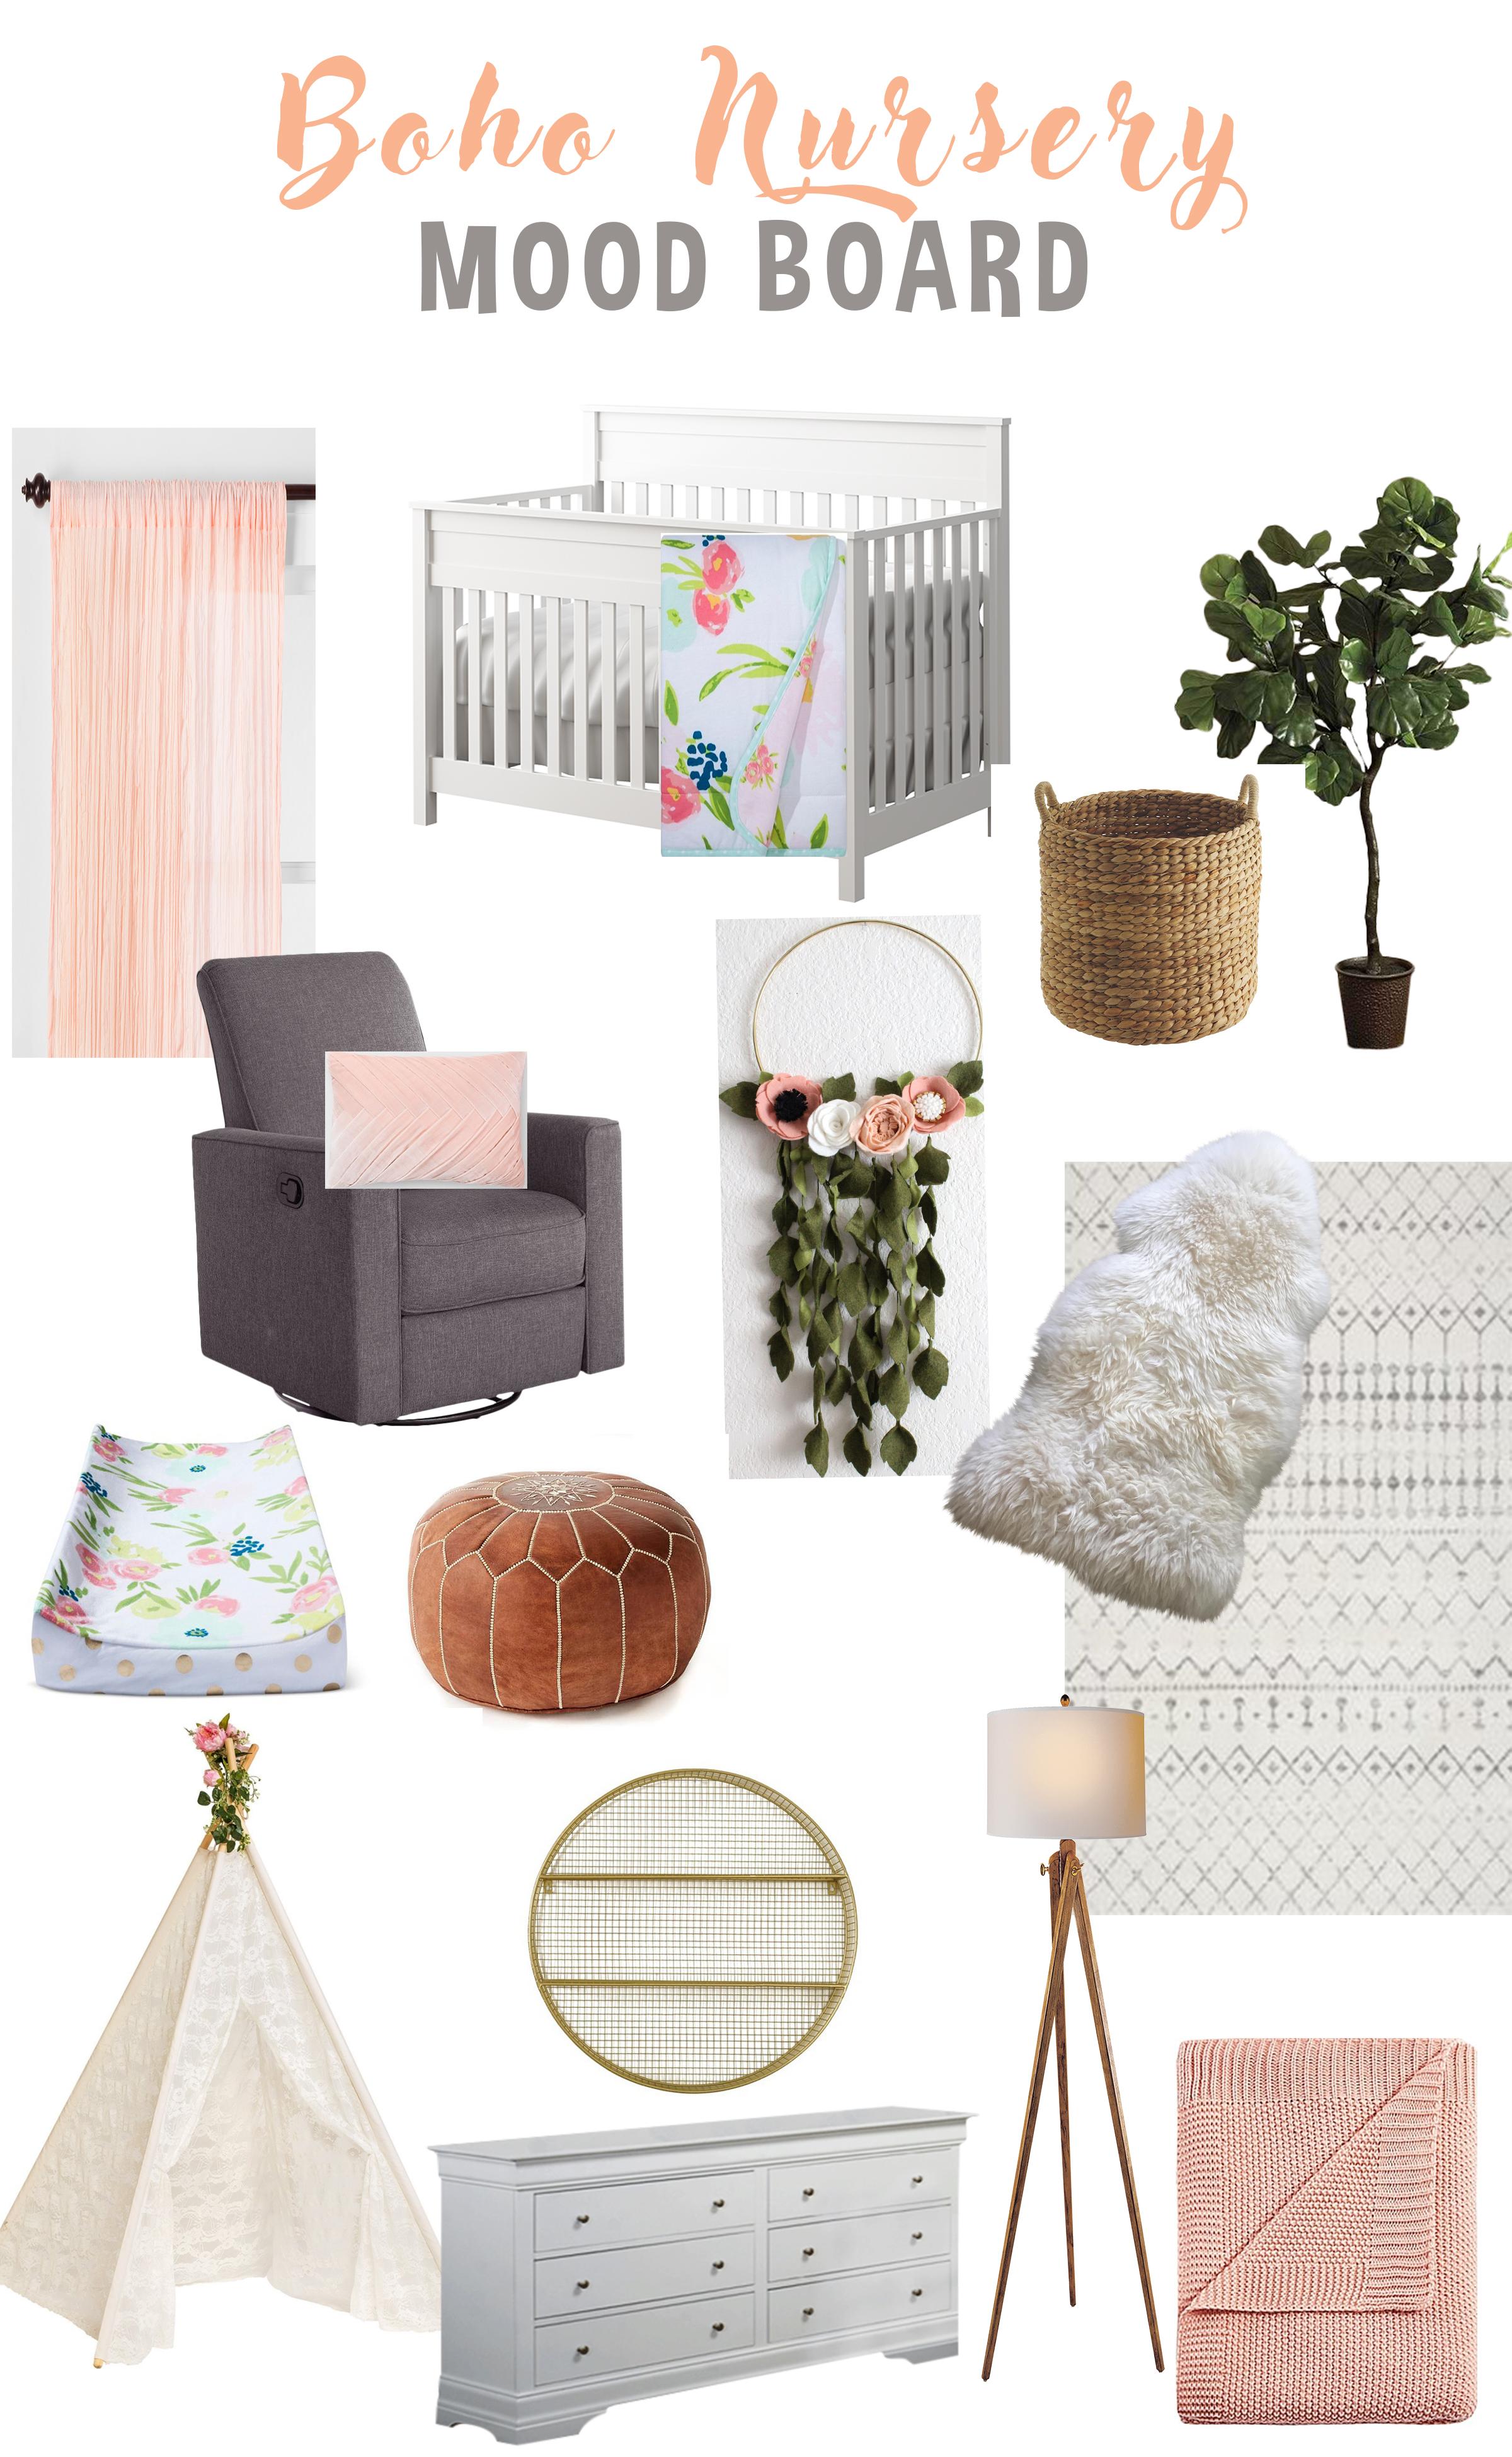 Just Being Britt Brittany Jenkins Pregnancy Journey Boho Nursery Mood Board